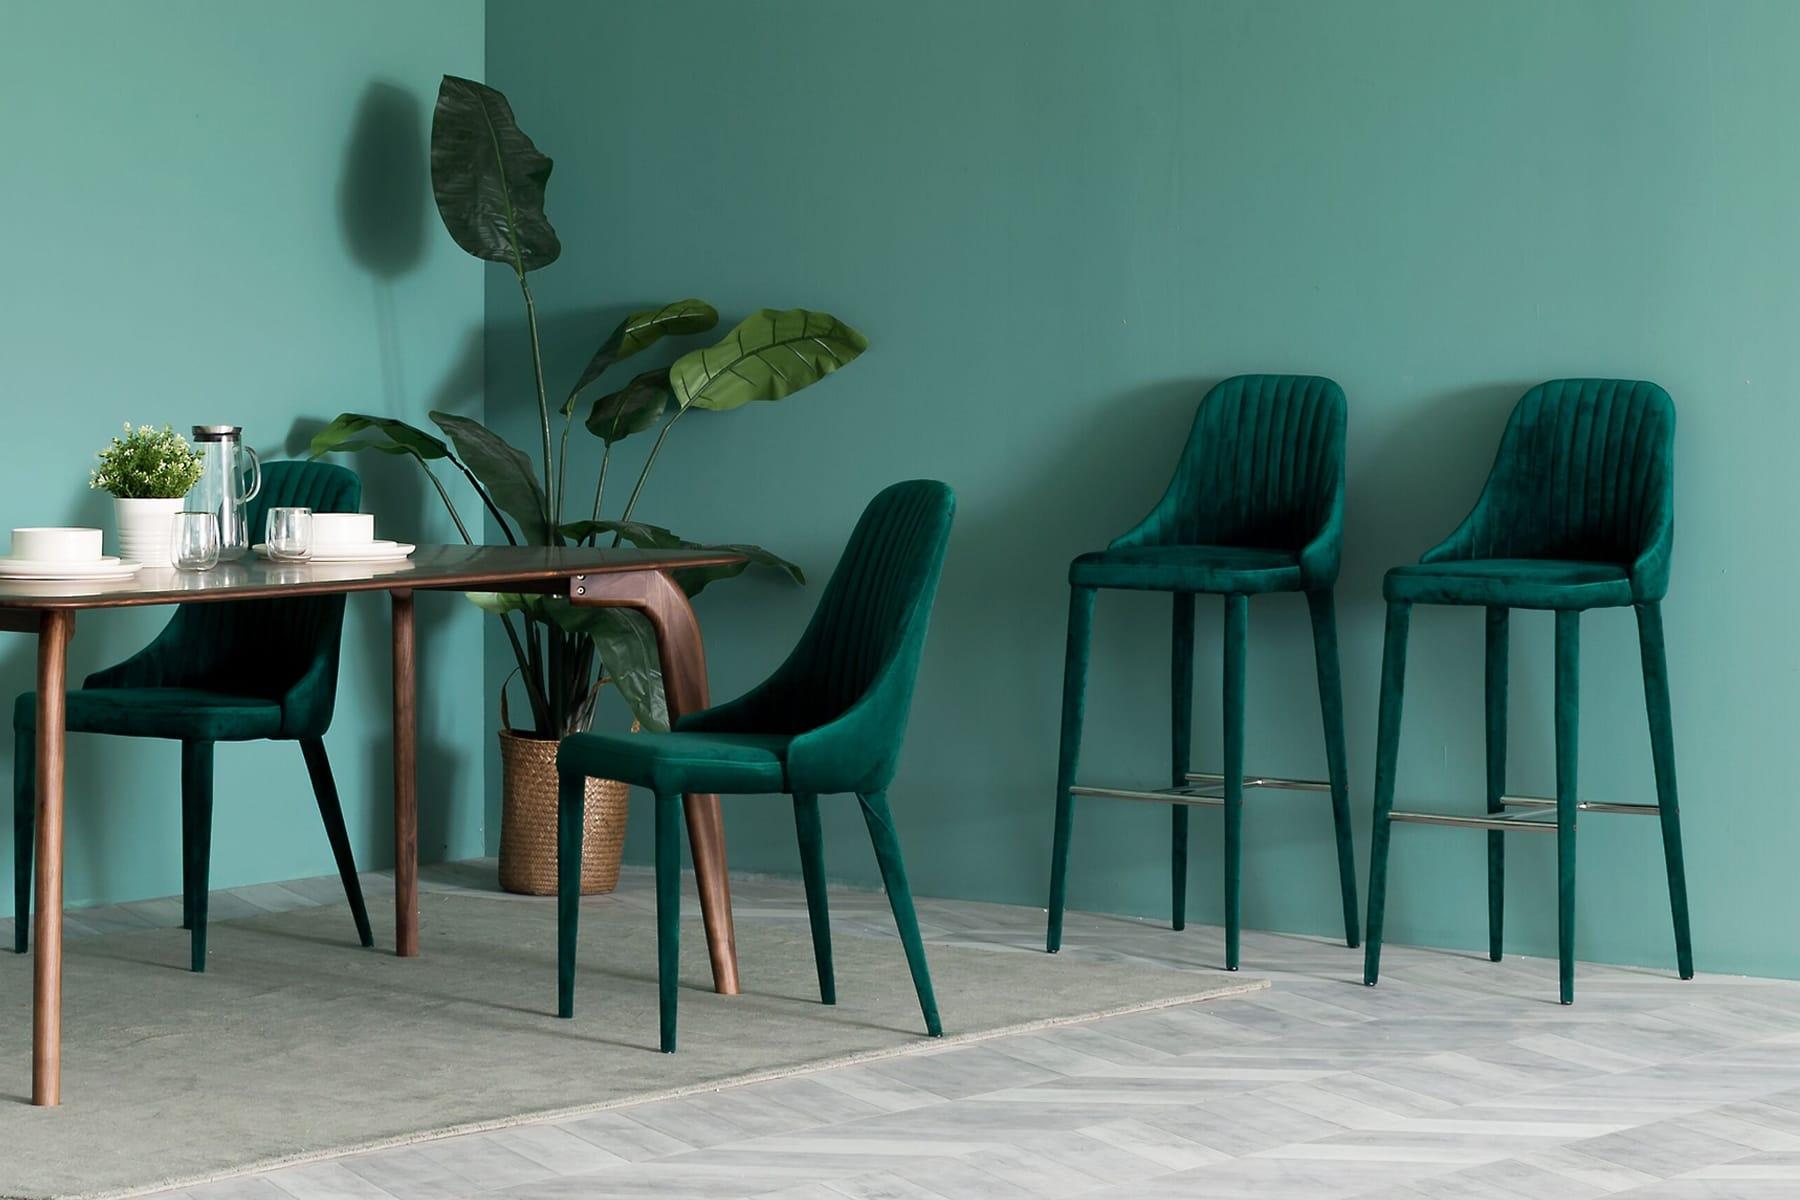 B4_Torri Counter Chair